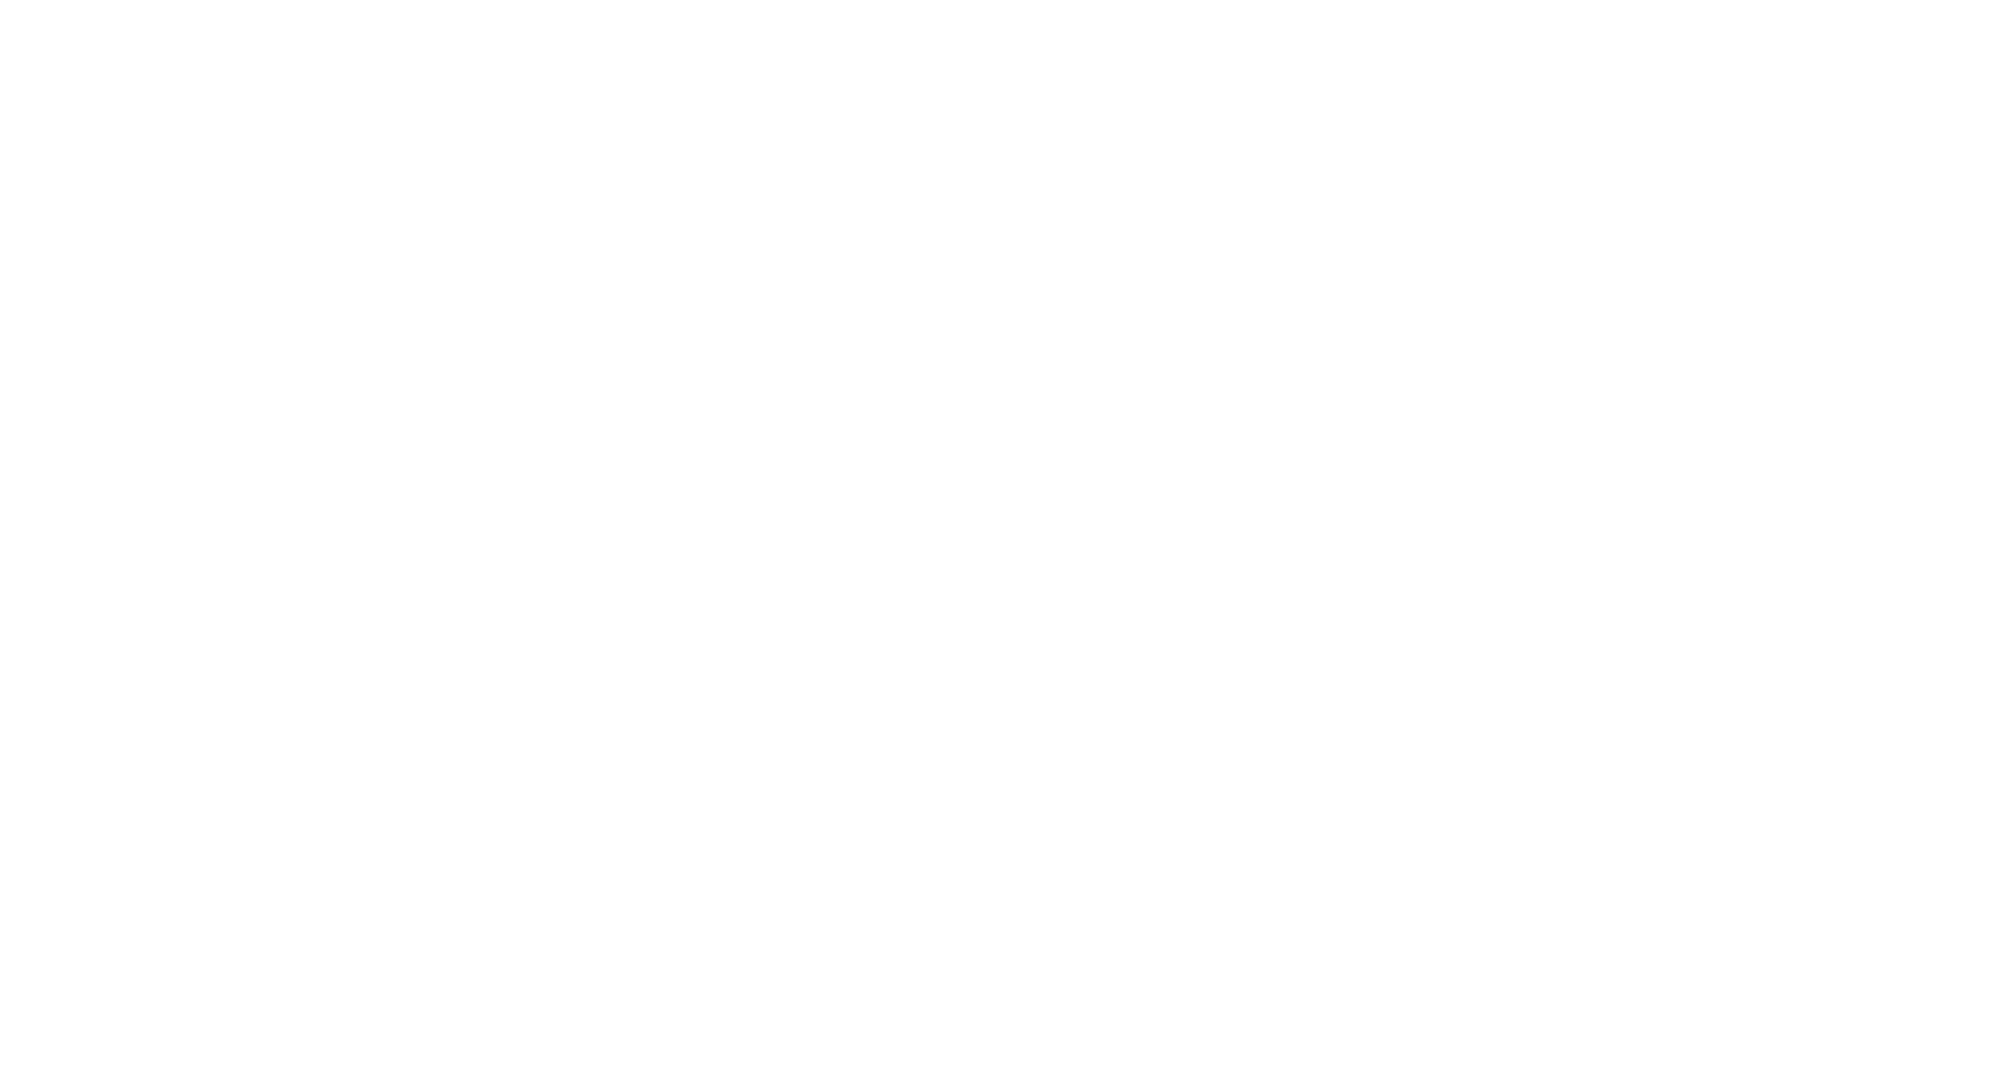 Wordpress - Website Design and Development Pricing